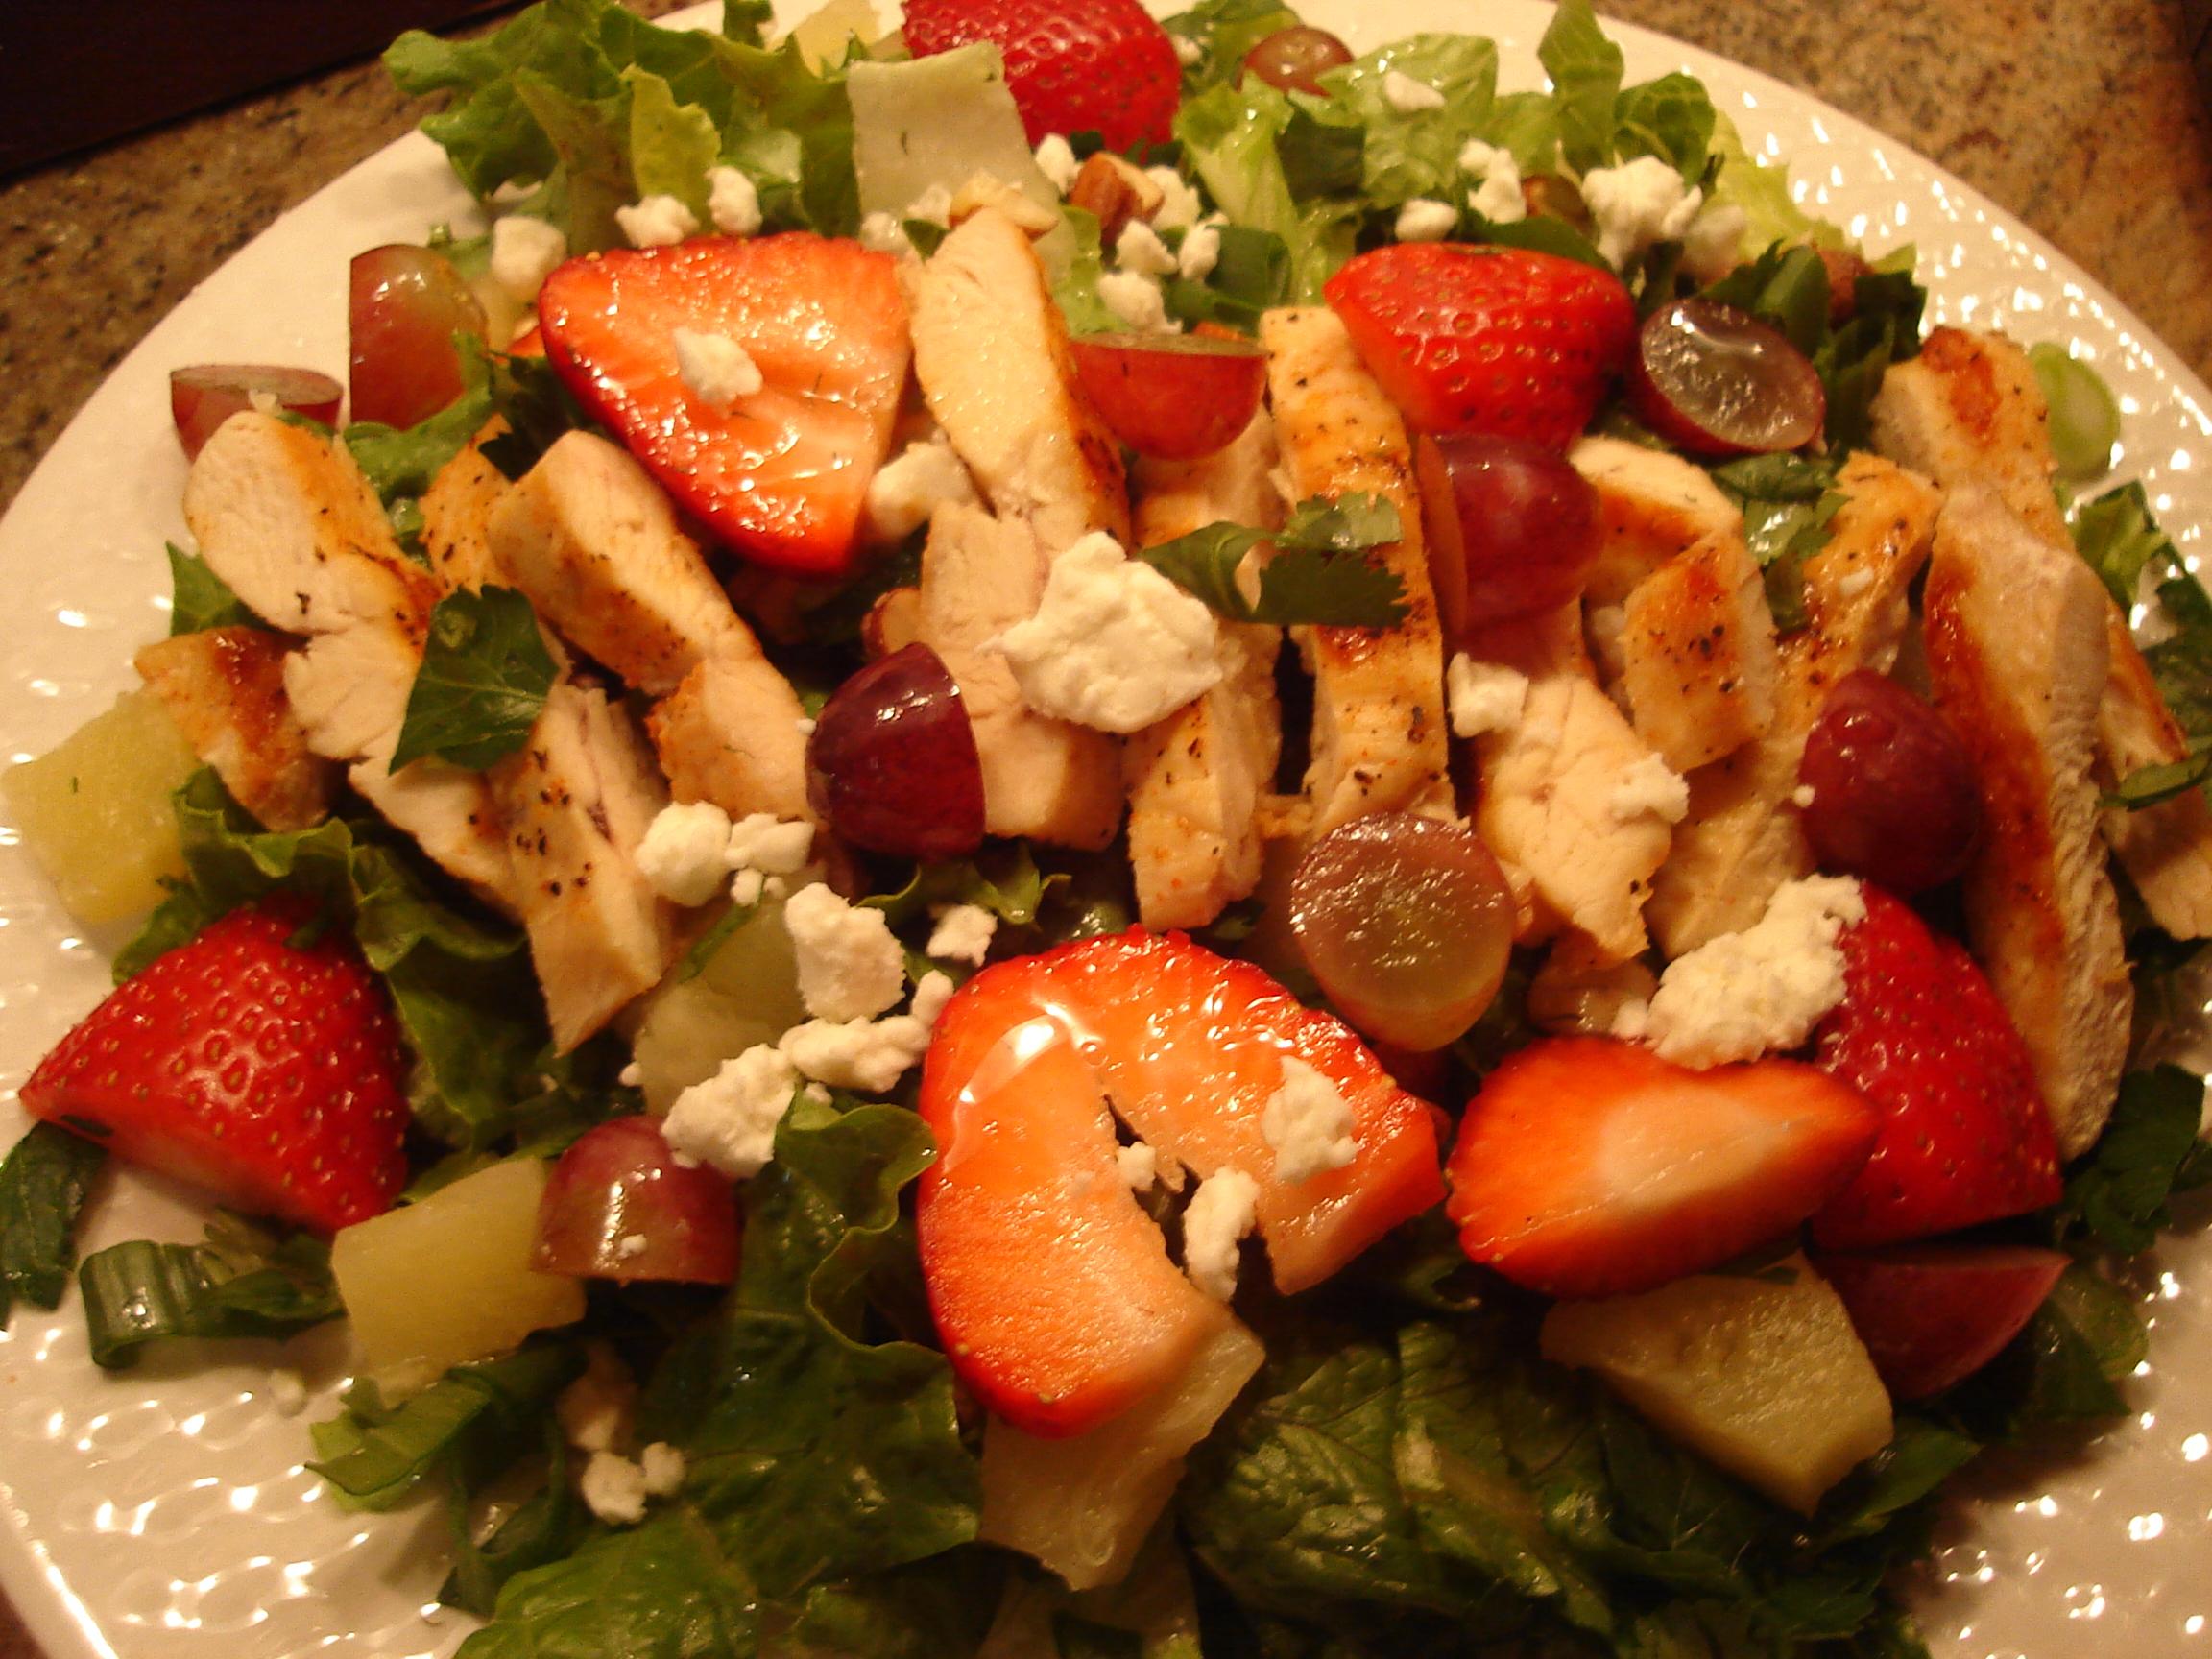 Arsenal scotland fresh fruit salad dressing fruit salad for Decoration salade